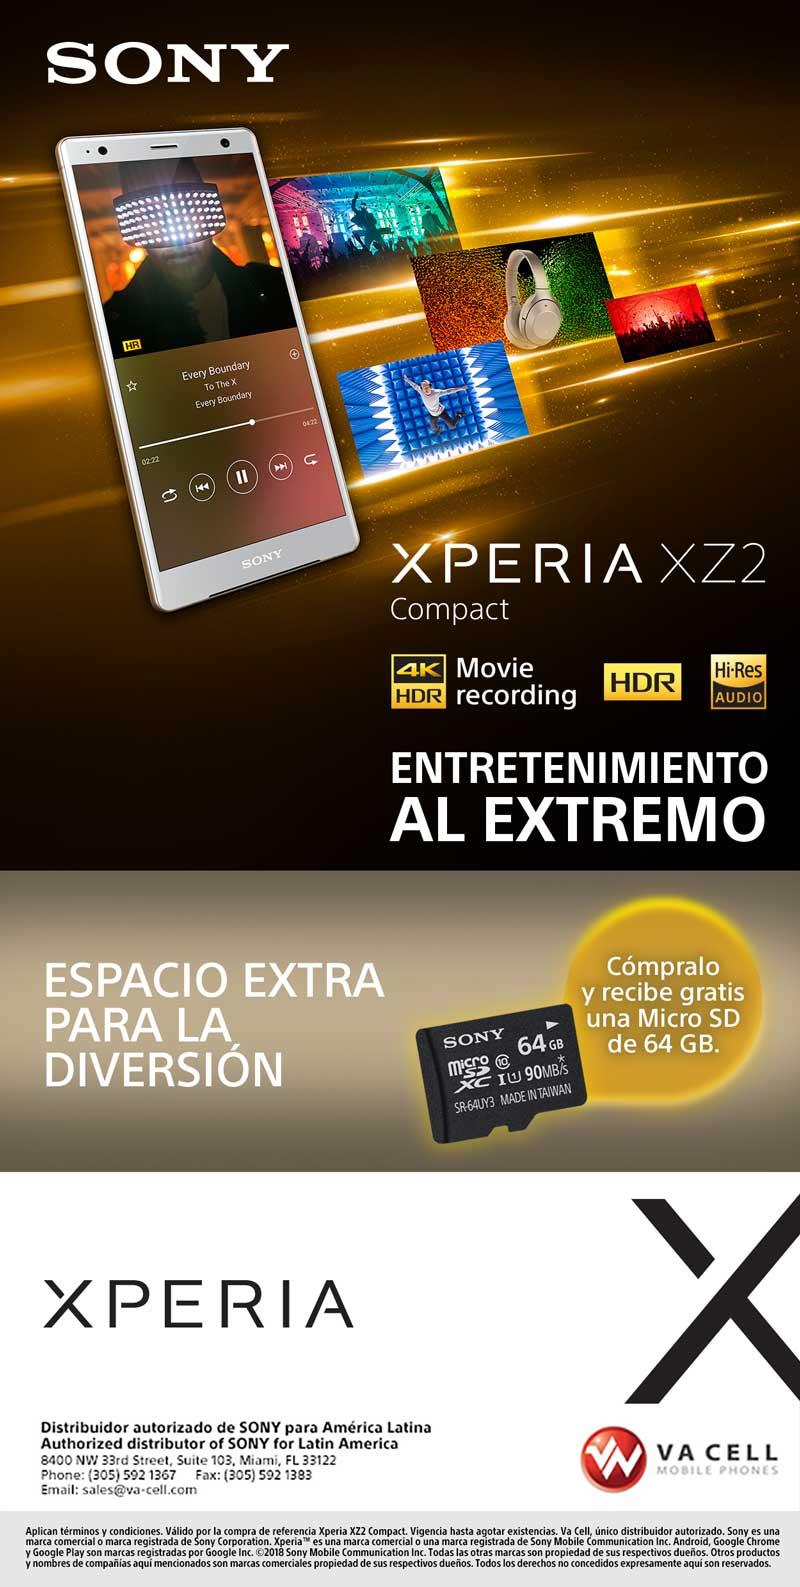 wholesaler of xperia xz2